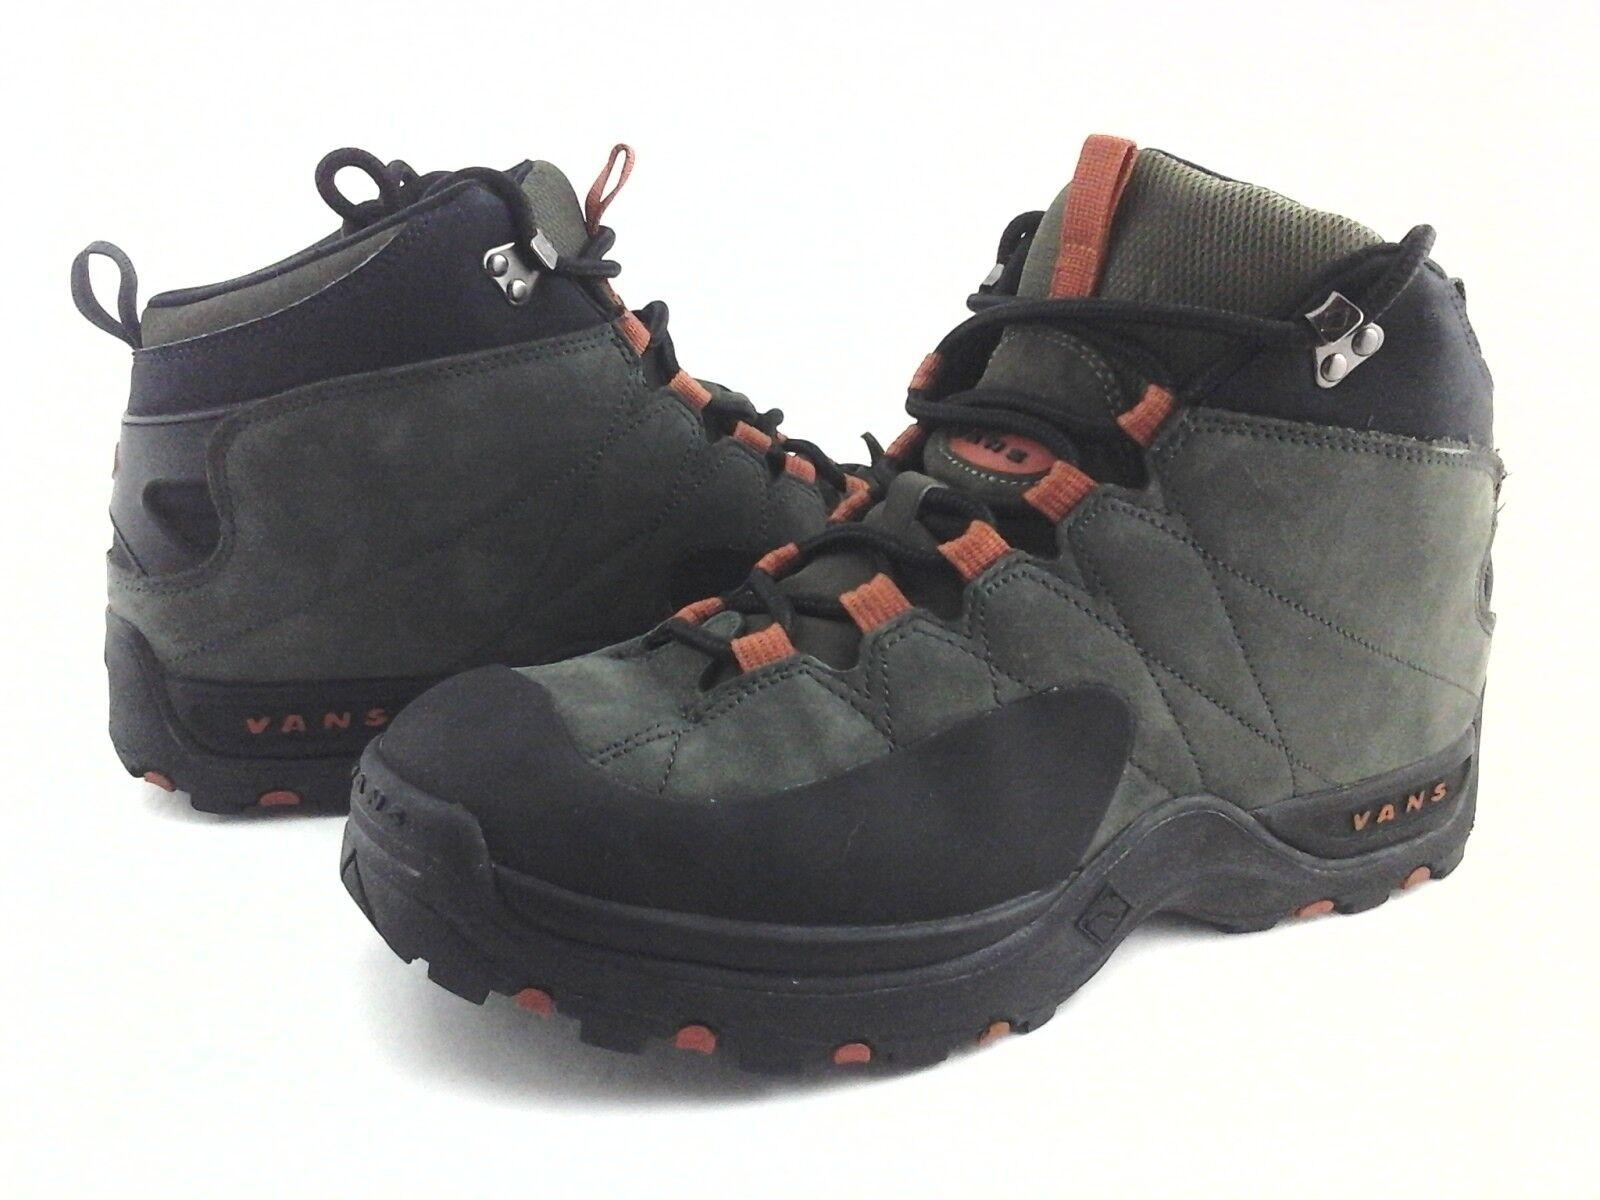 VANS Senderismo botas Invierno Nieve emigre verde Naranja Negro para Hombre US 11 Rara